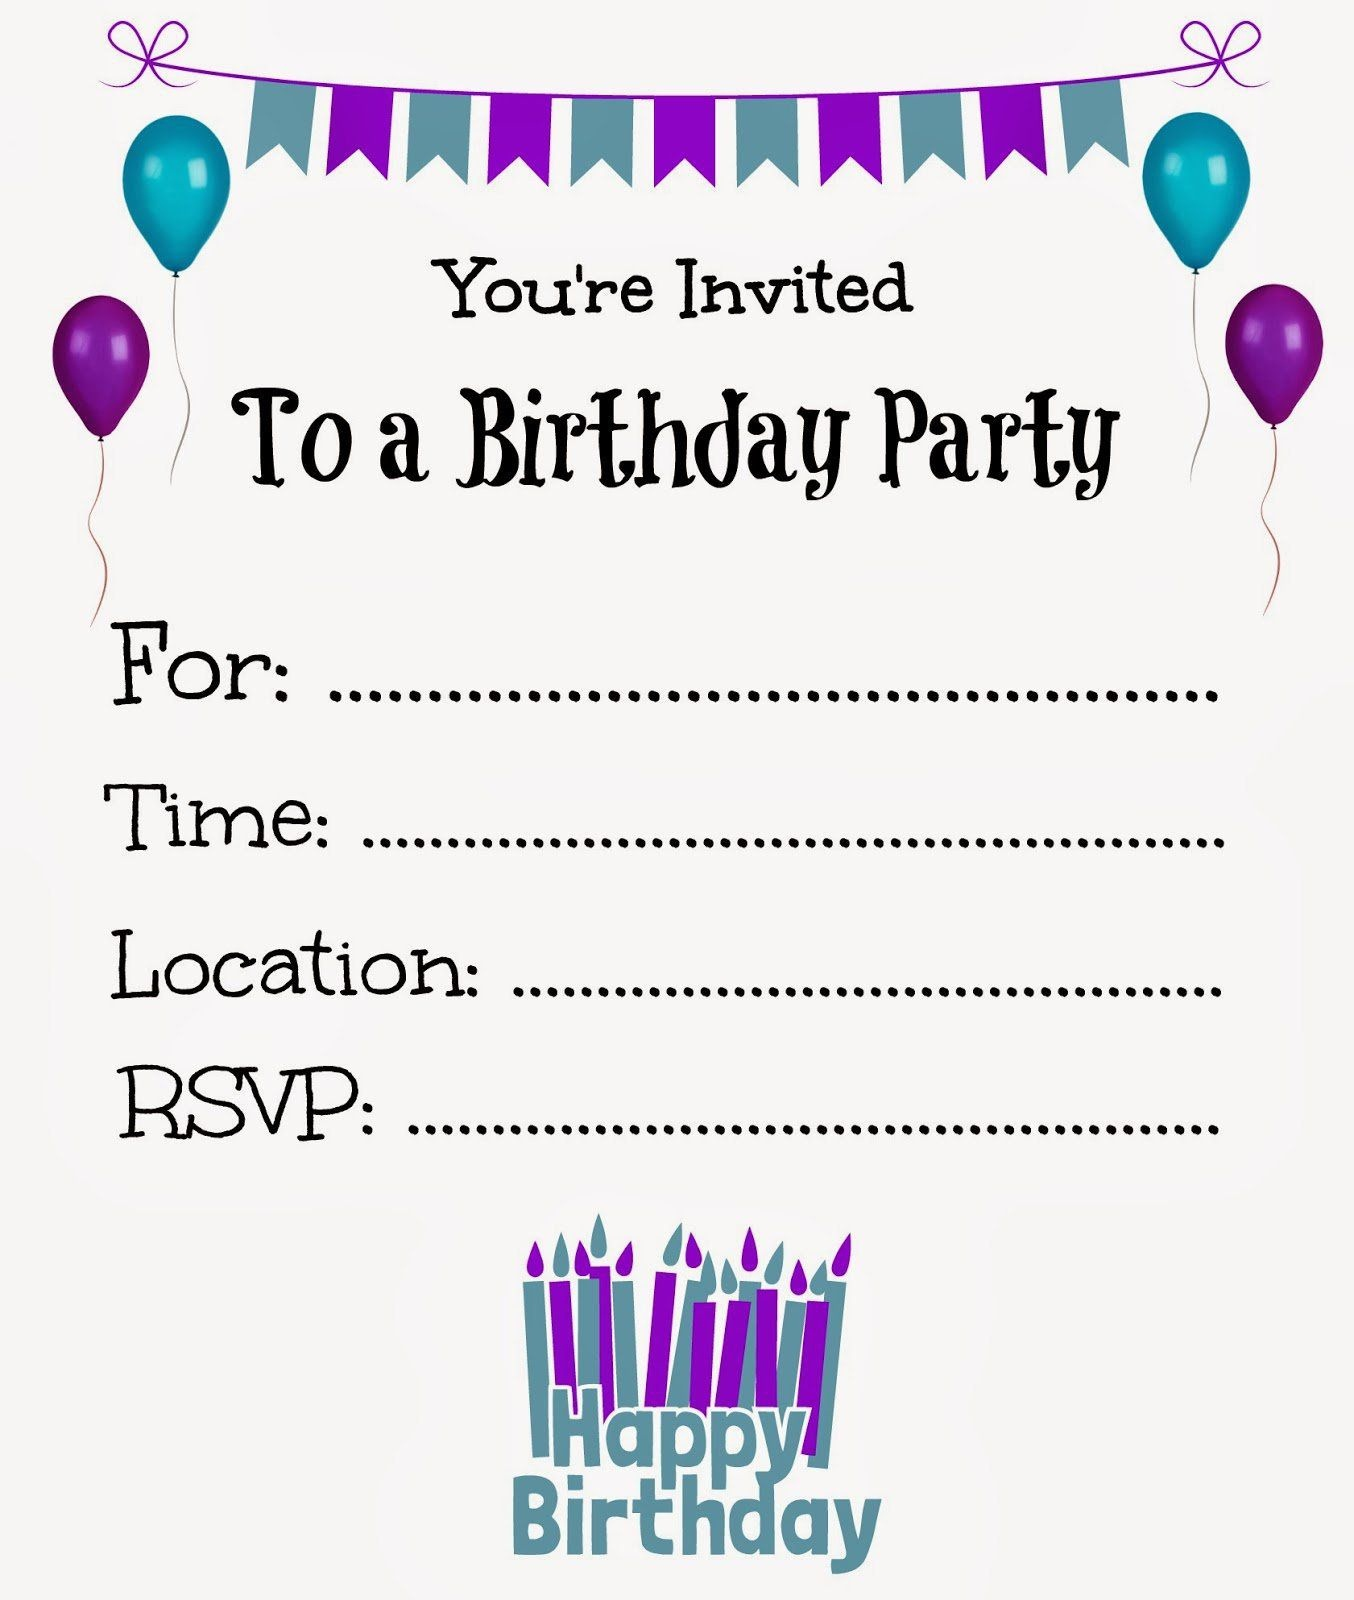 Birthday Invitations Cards Online | Birthday Invitations Template - Birthday Party Invitations Online Free Printable